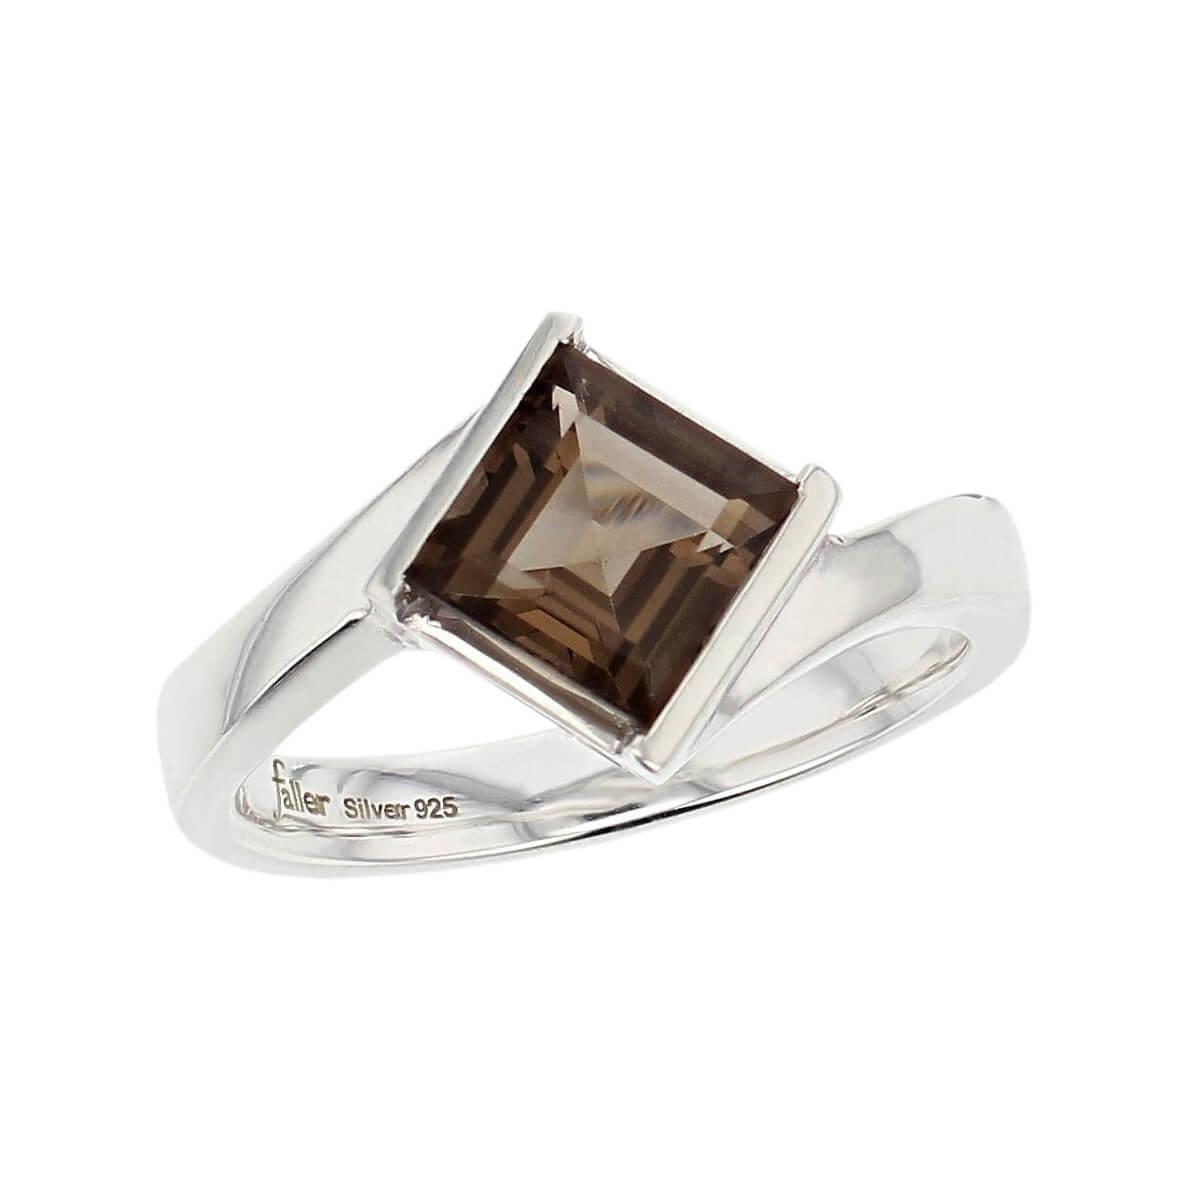 sterling silver square cut faceted smoky quartz gemstone dress ring, designer jewellery, smokey quartz gem, jewelry, handmade by Faller, Londonderry, Northern Ireland, Irish hand crafted, darcy, D'arcy